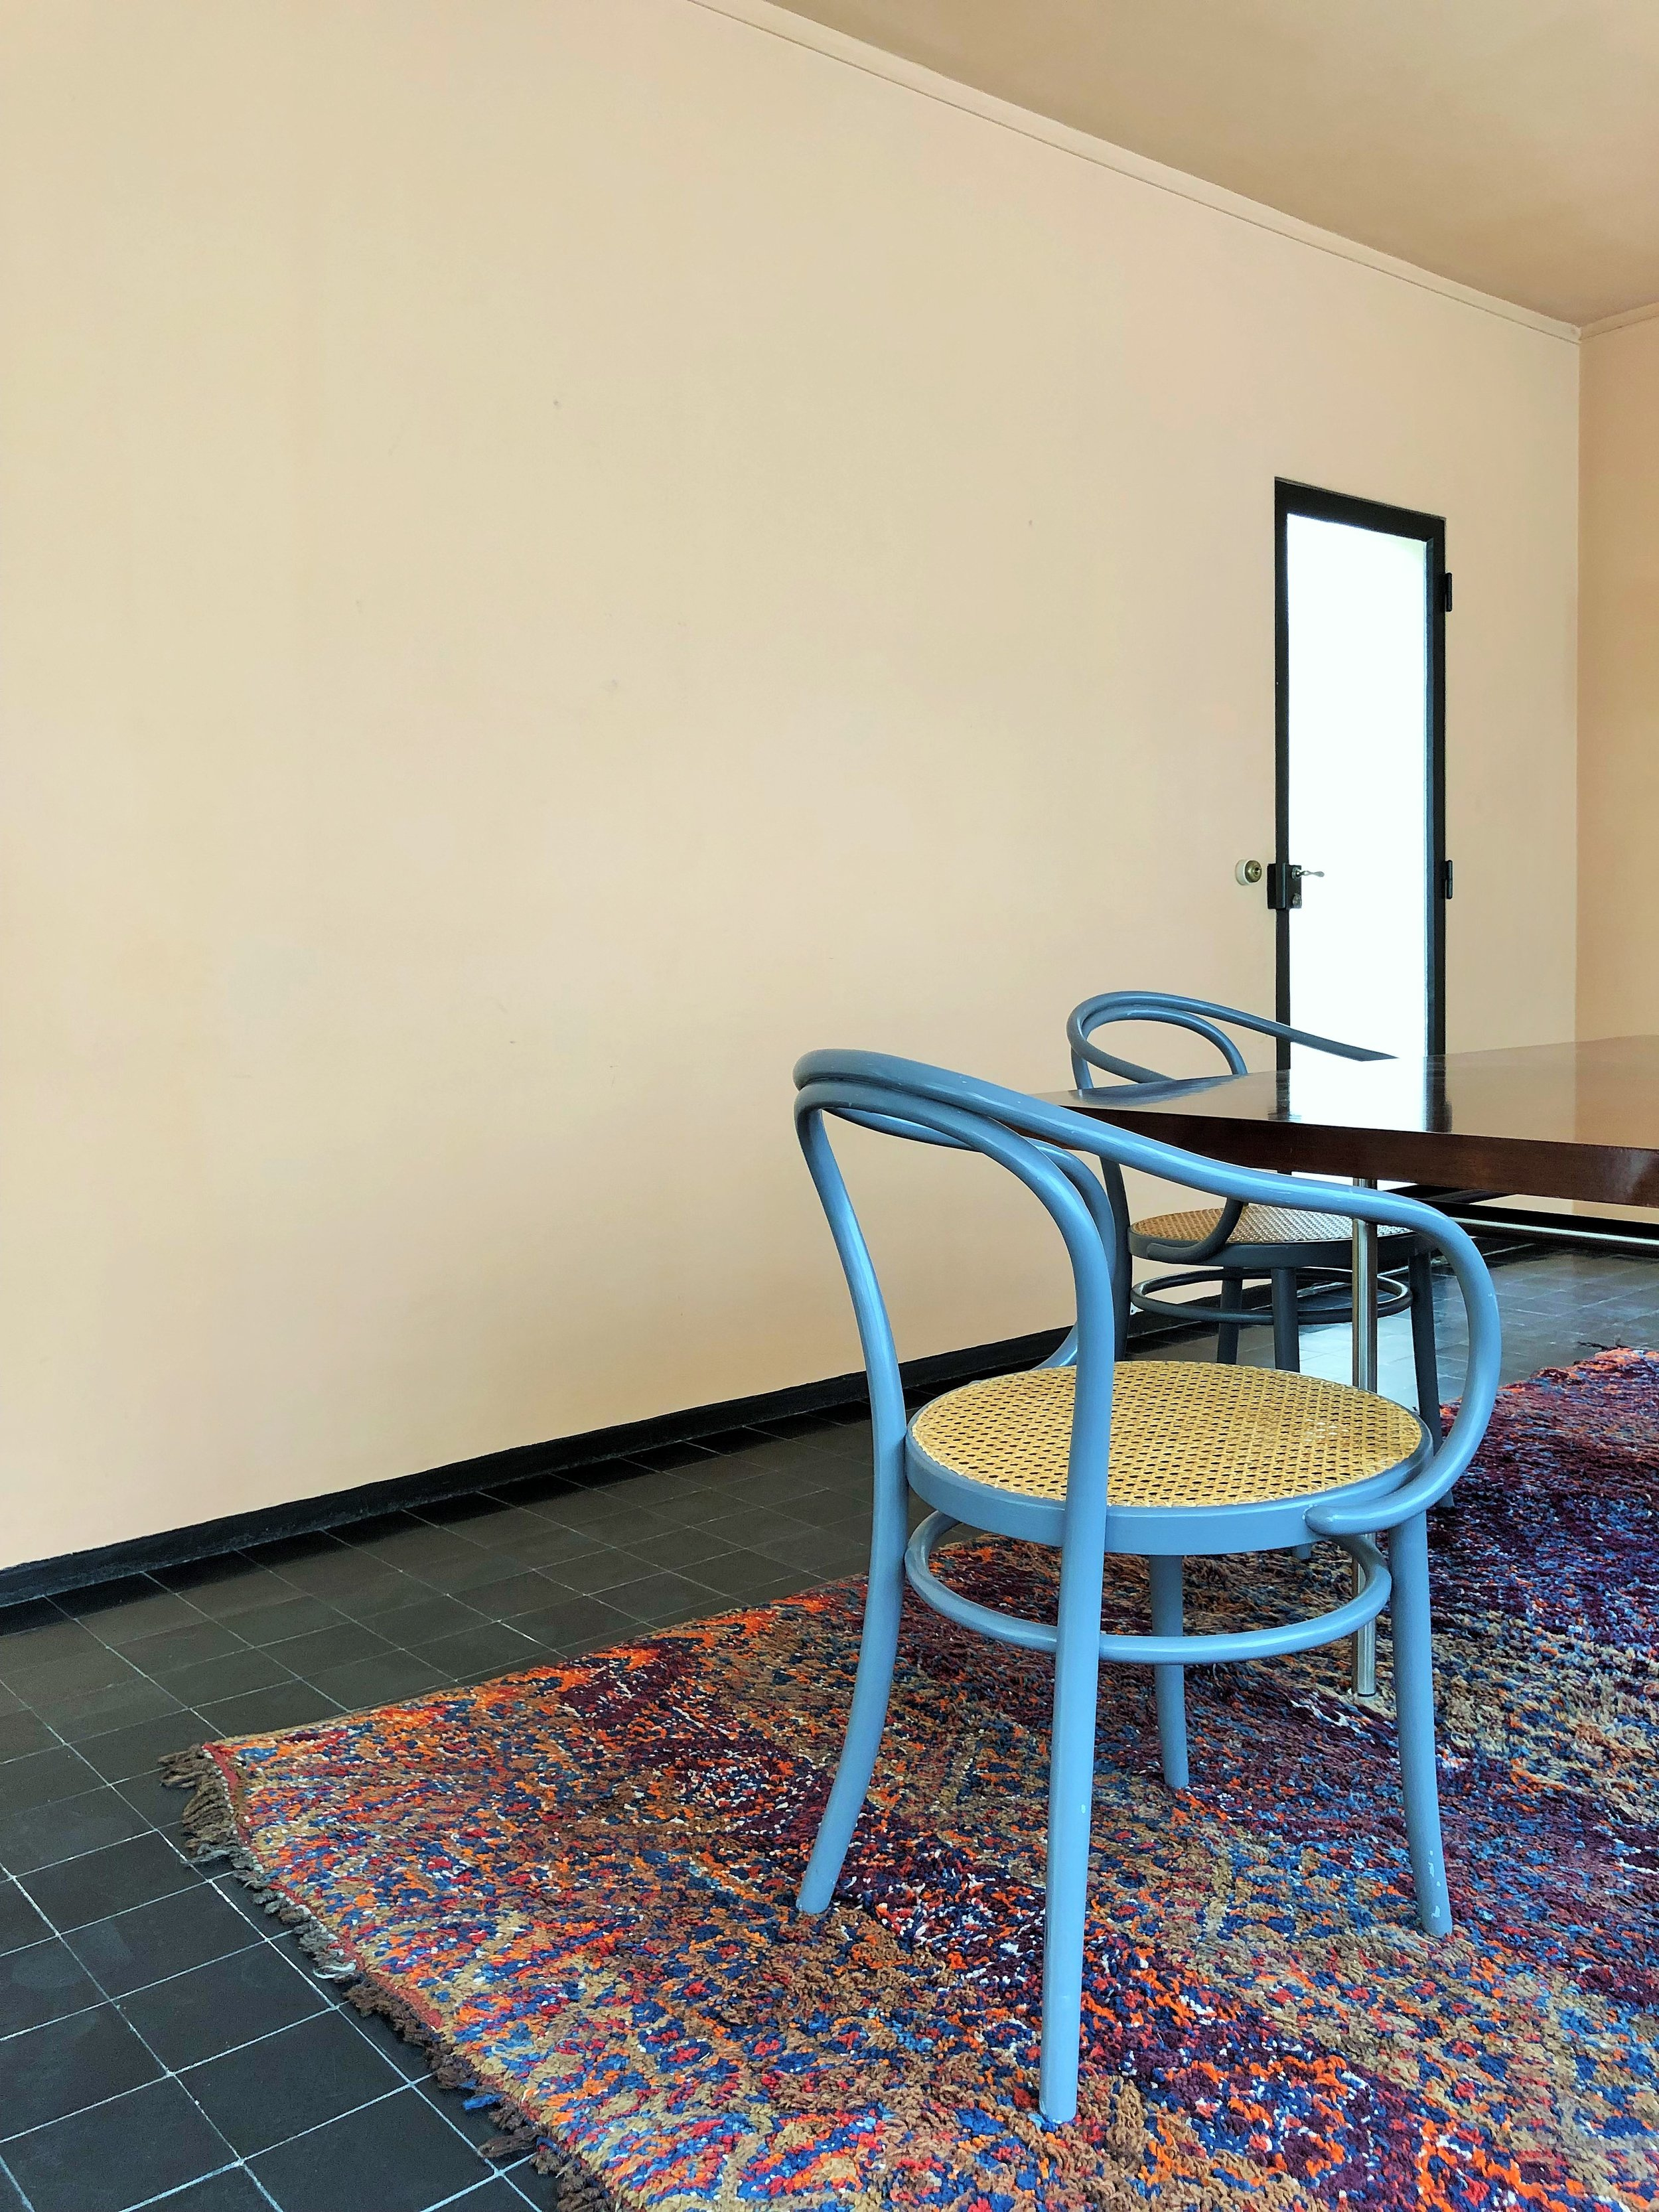 The dining room, Maison La Roche, by Le Corbusier Photograph ©The London List